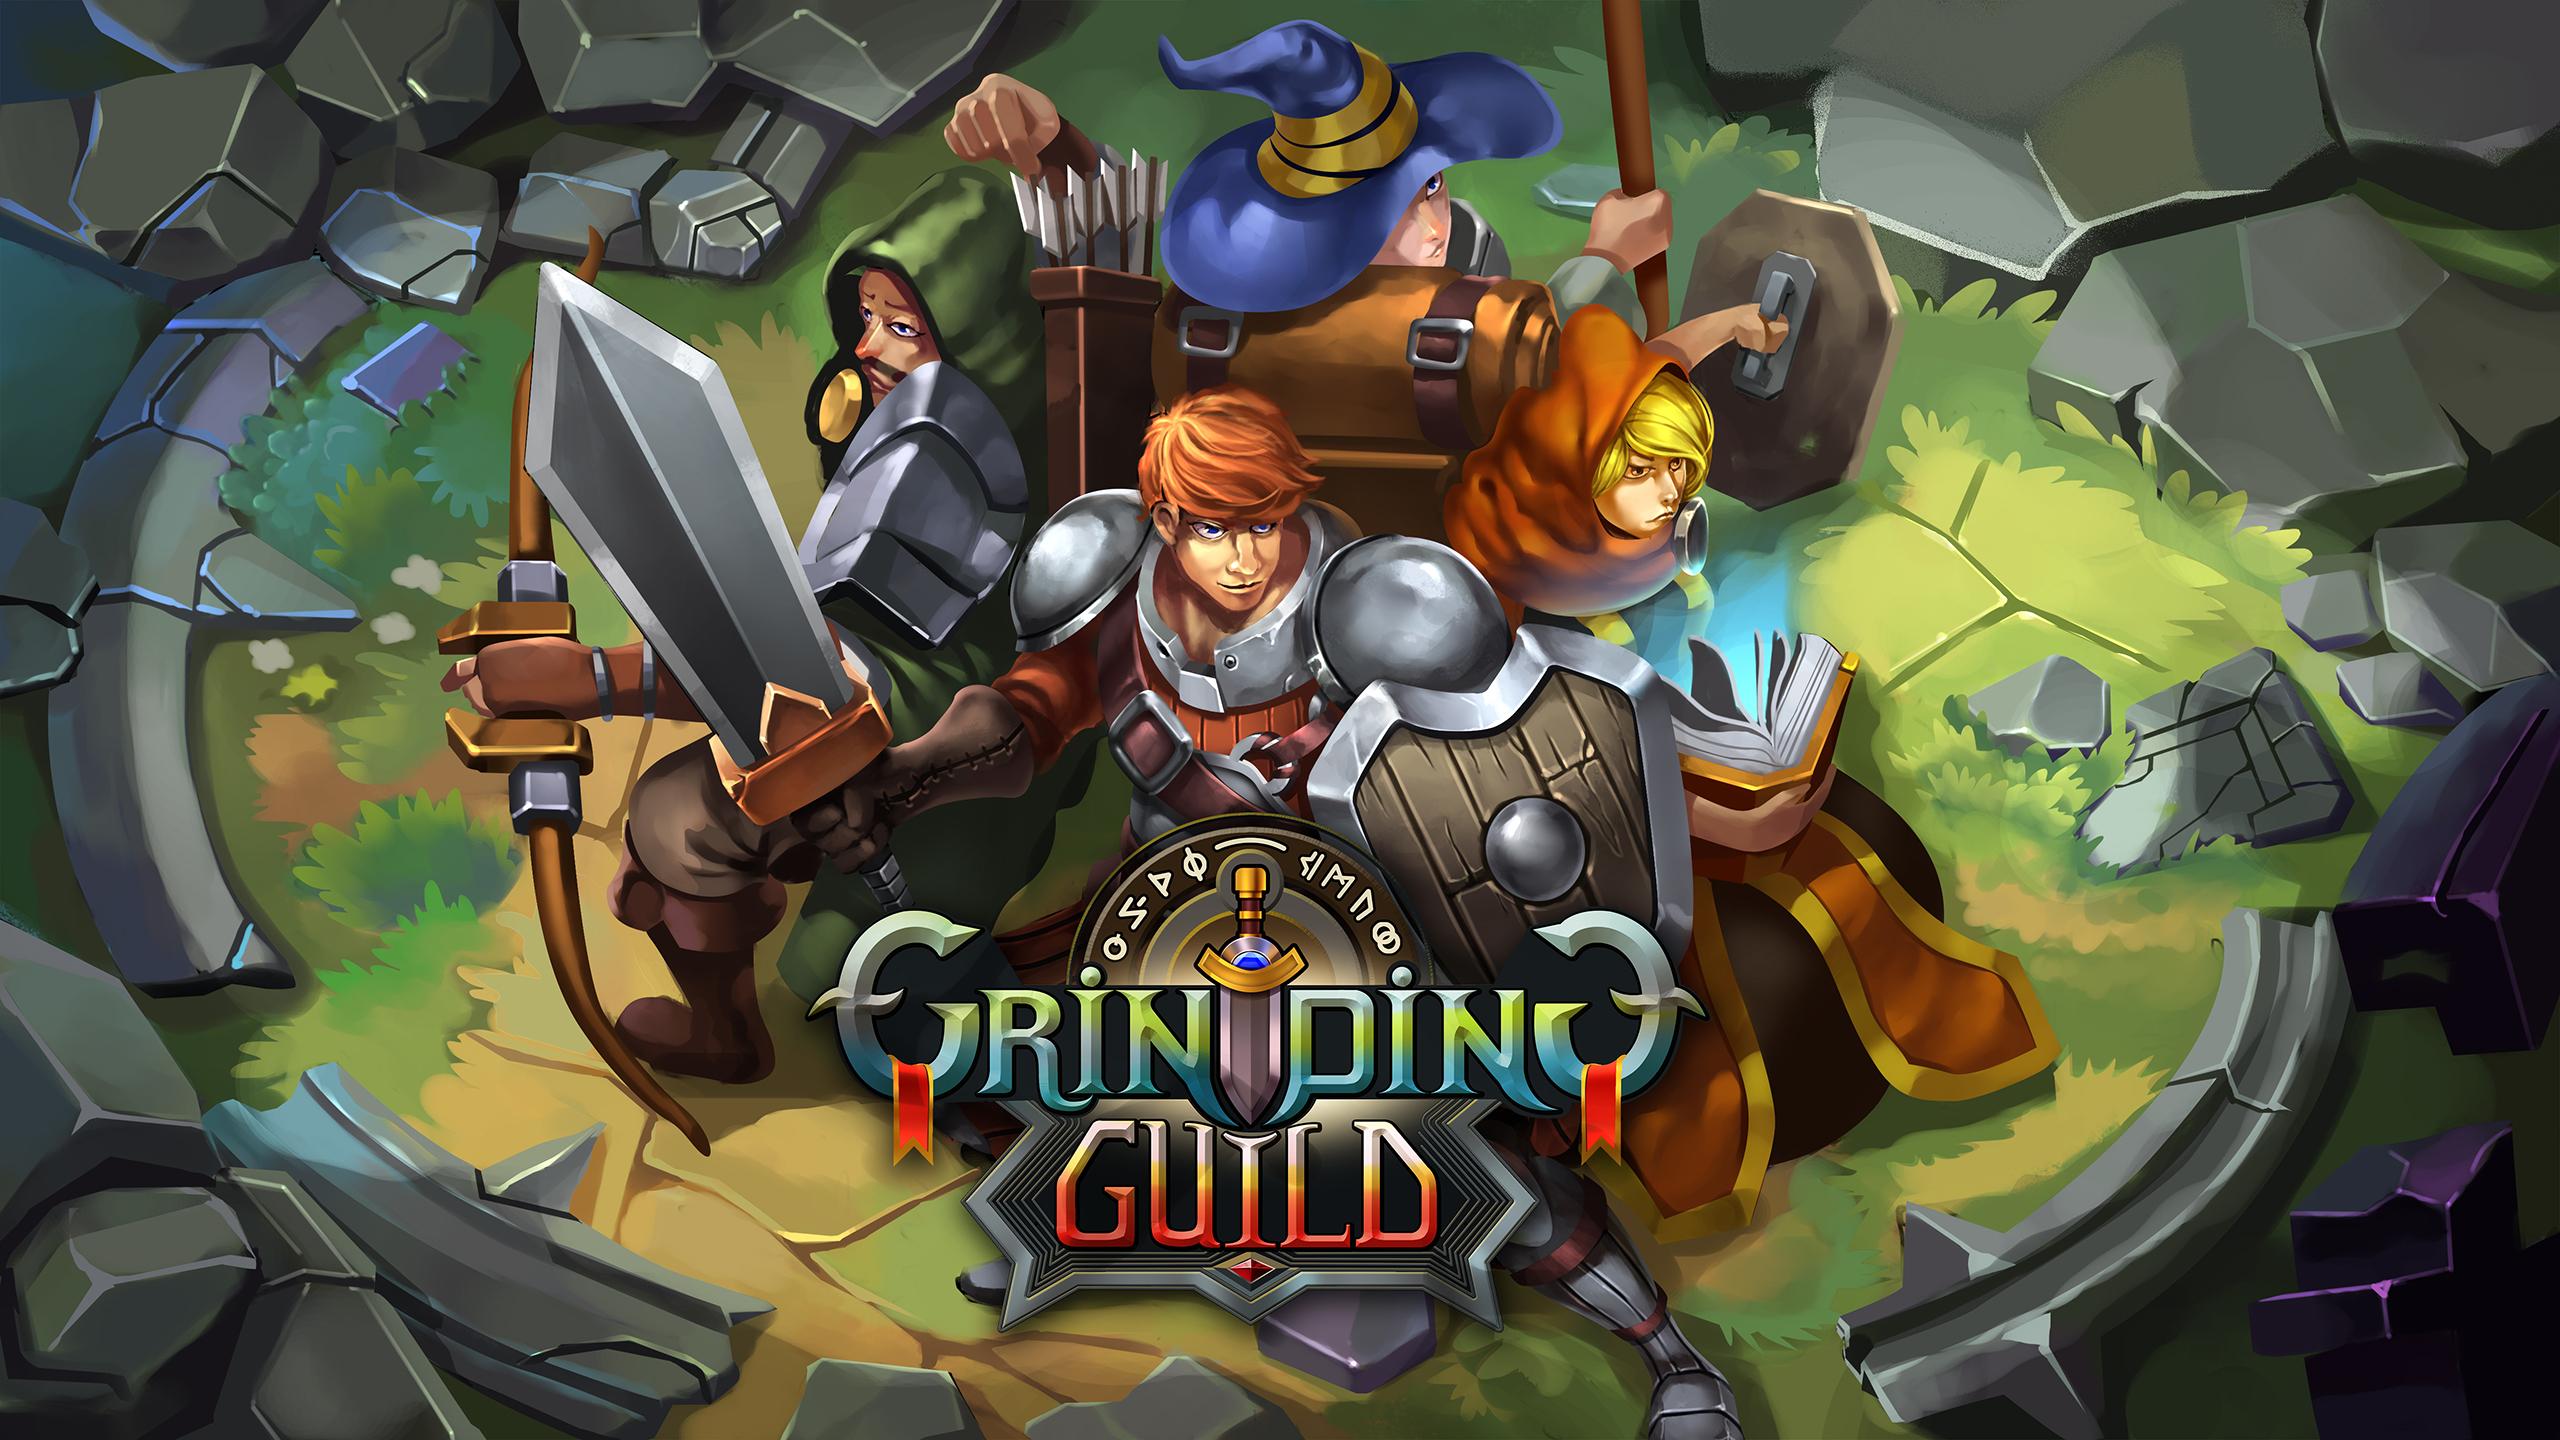 Grinding Guild